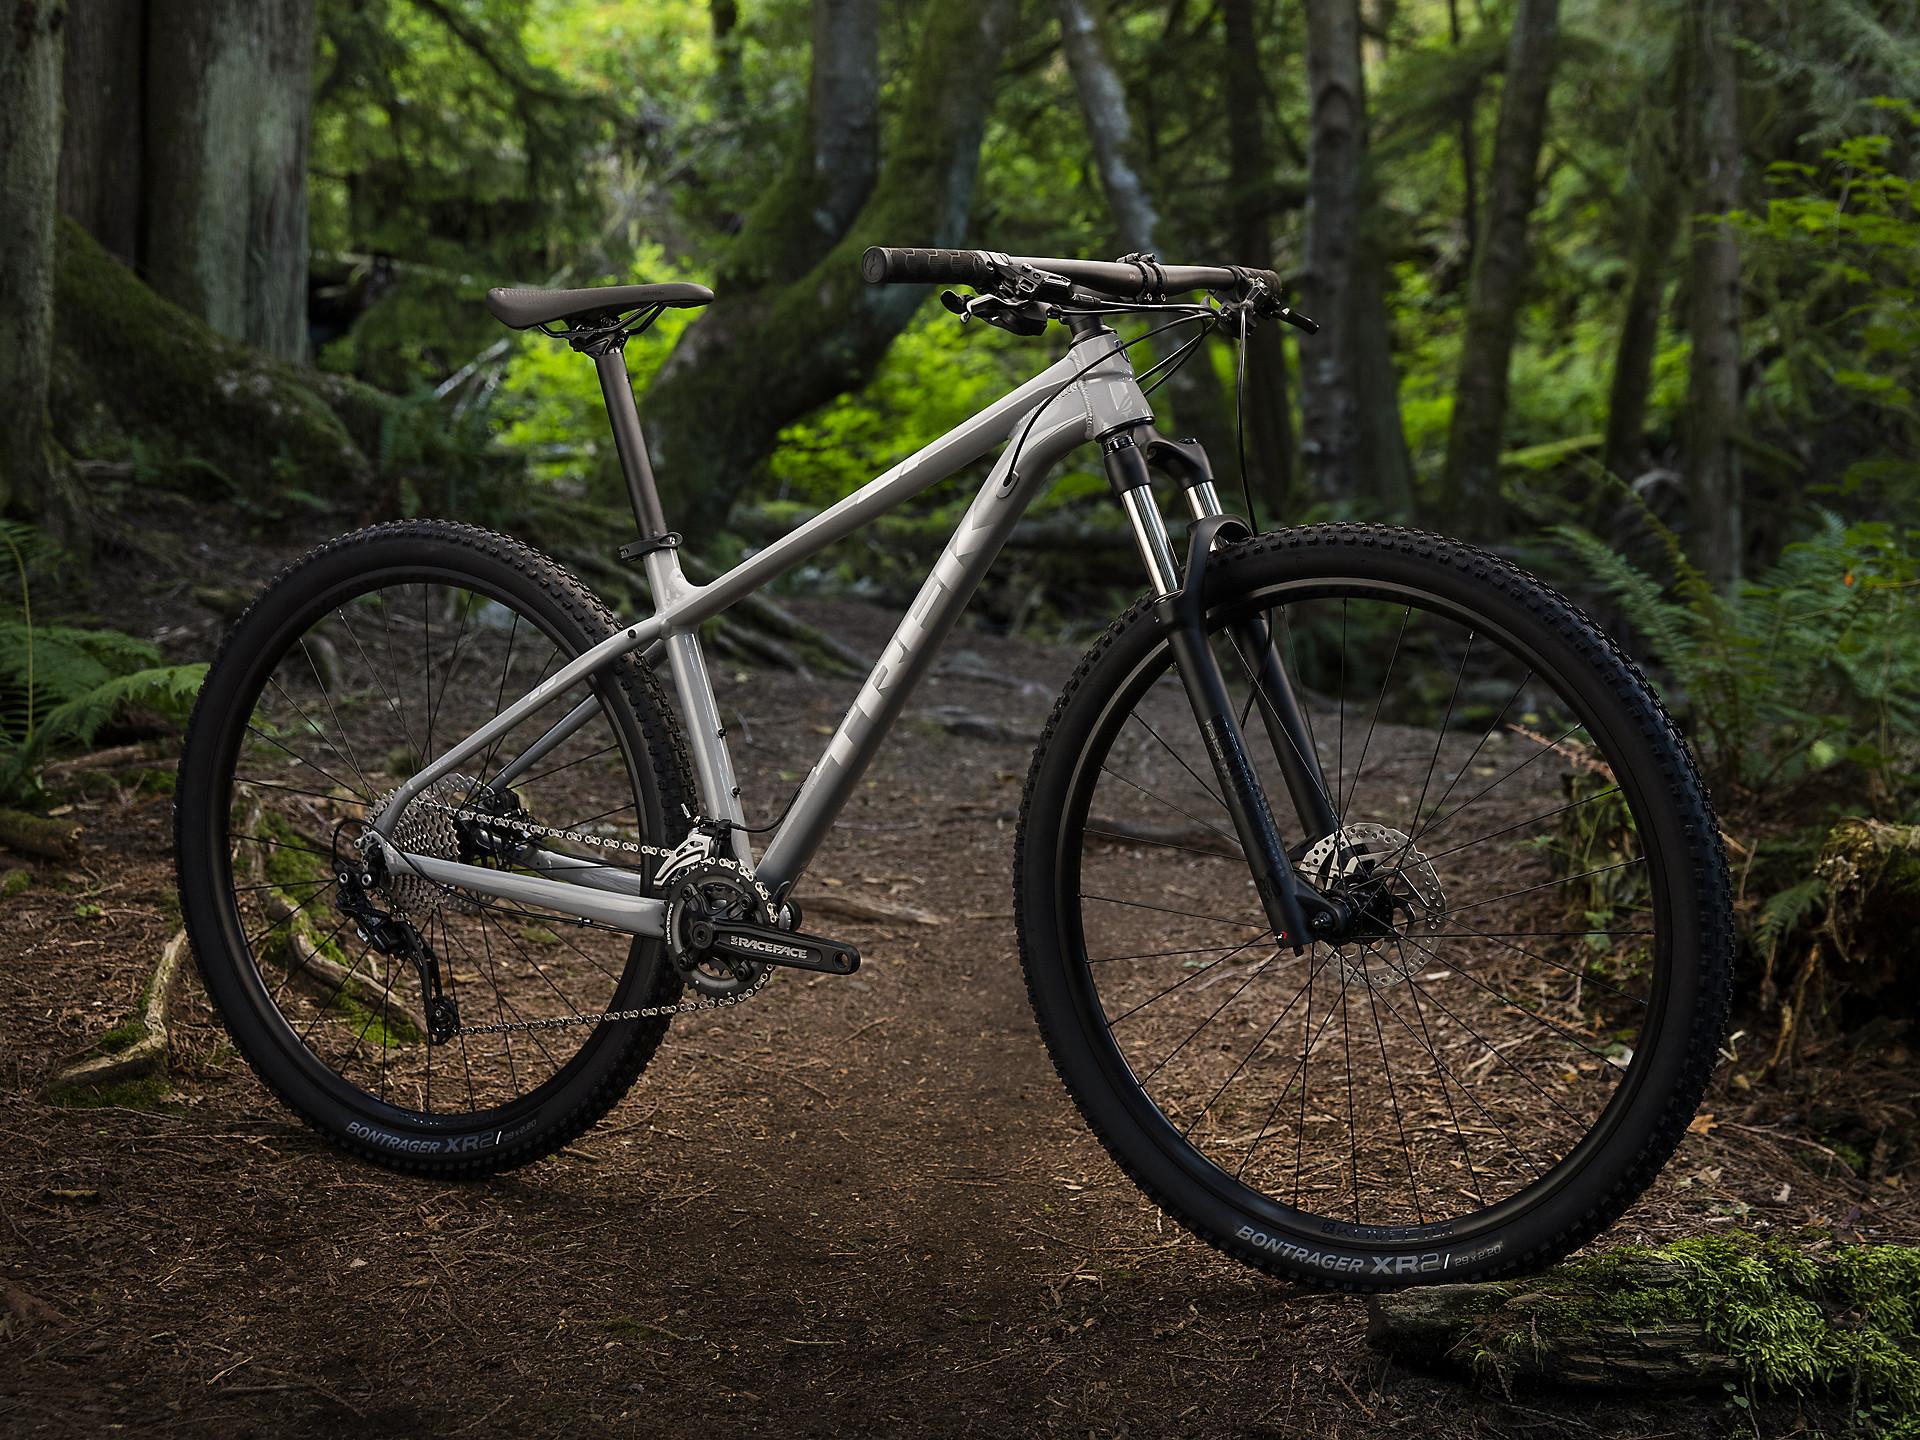 f02ae97c4b0 X-Caliber 8 | Trek Bikes